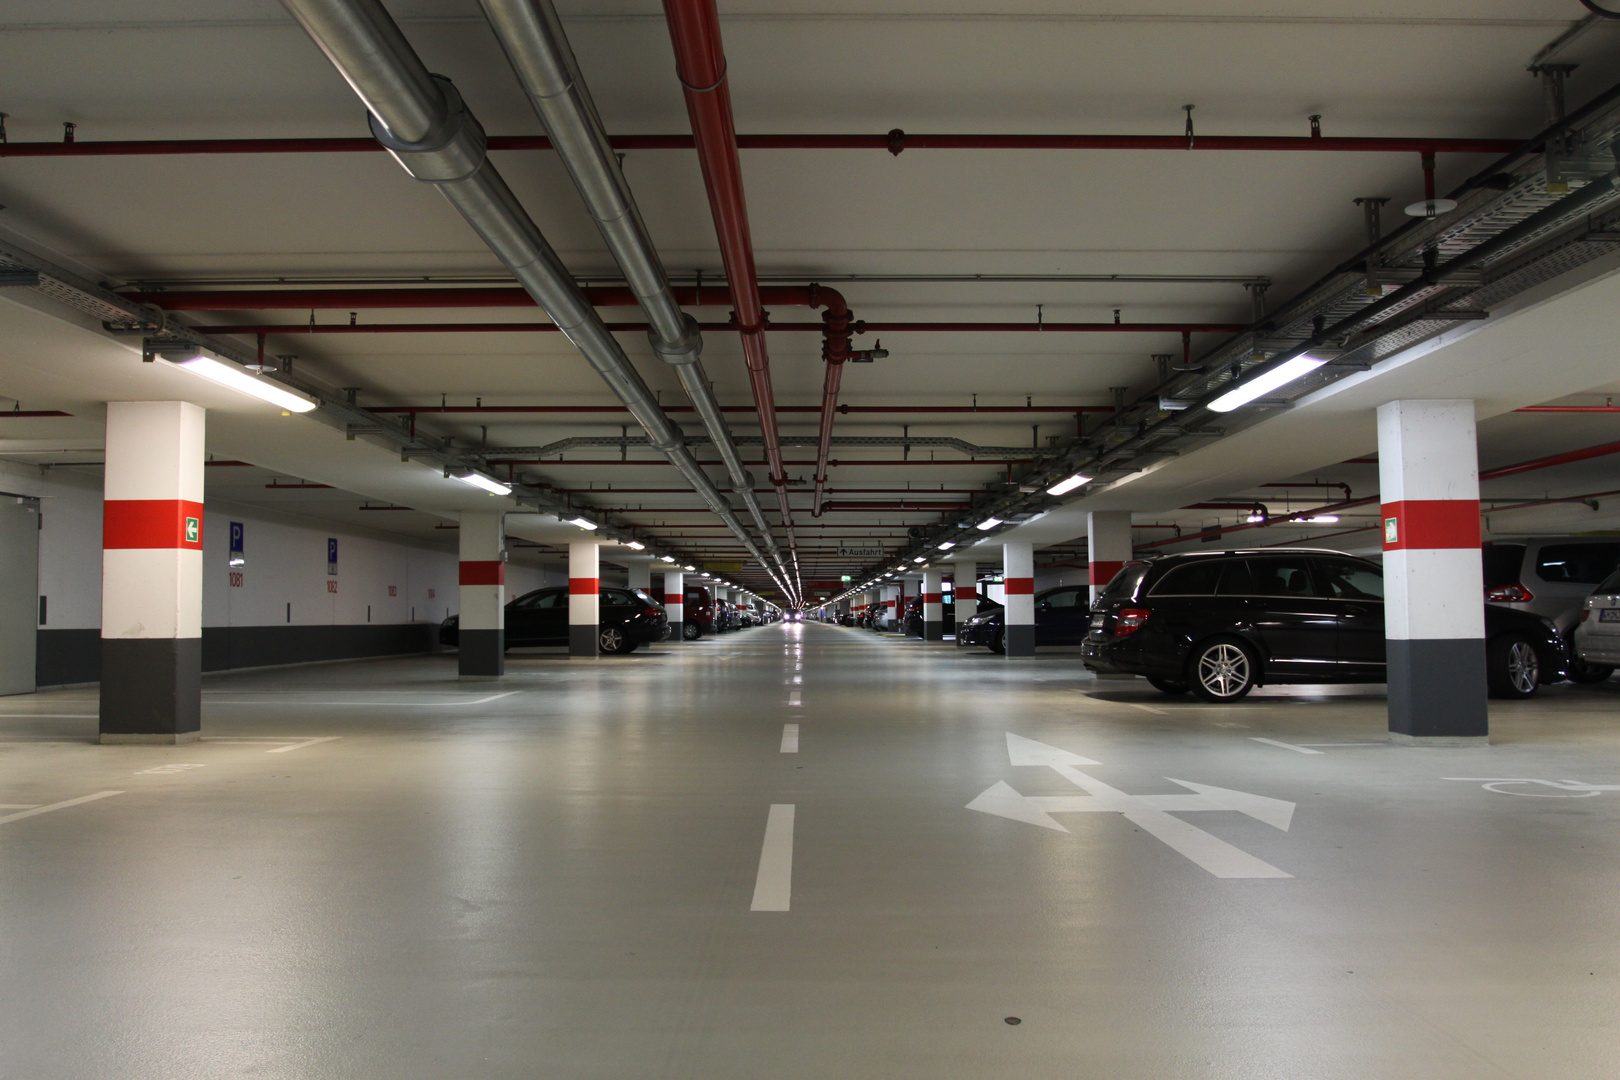 Längste Tiefgarage Europas in Köln